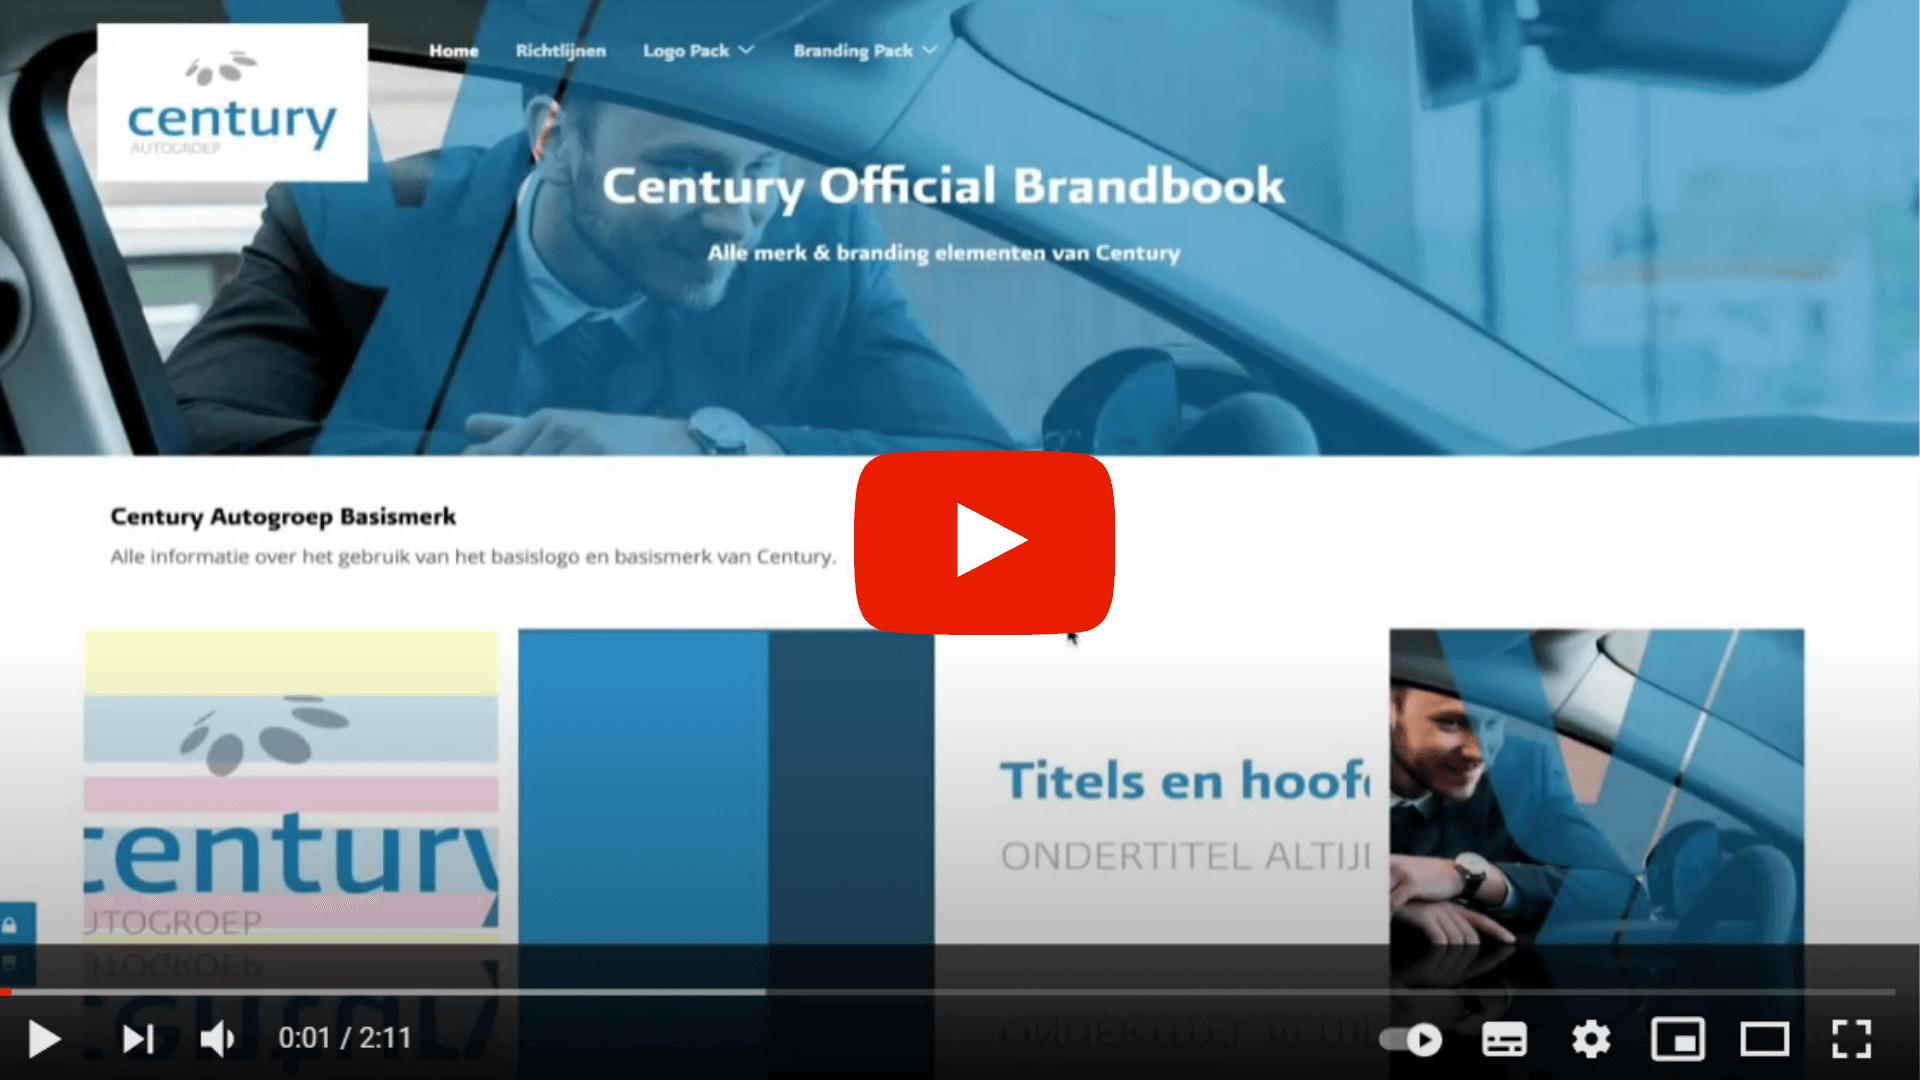 century official brandbook